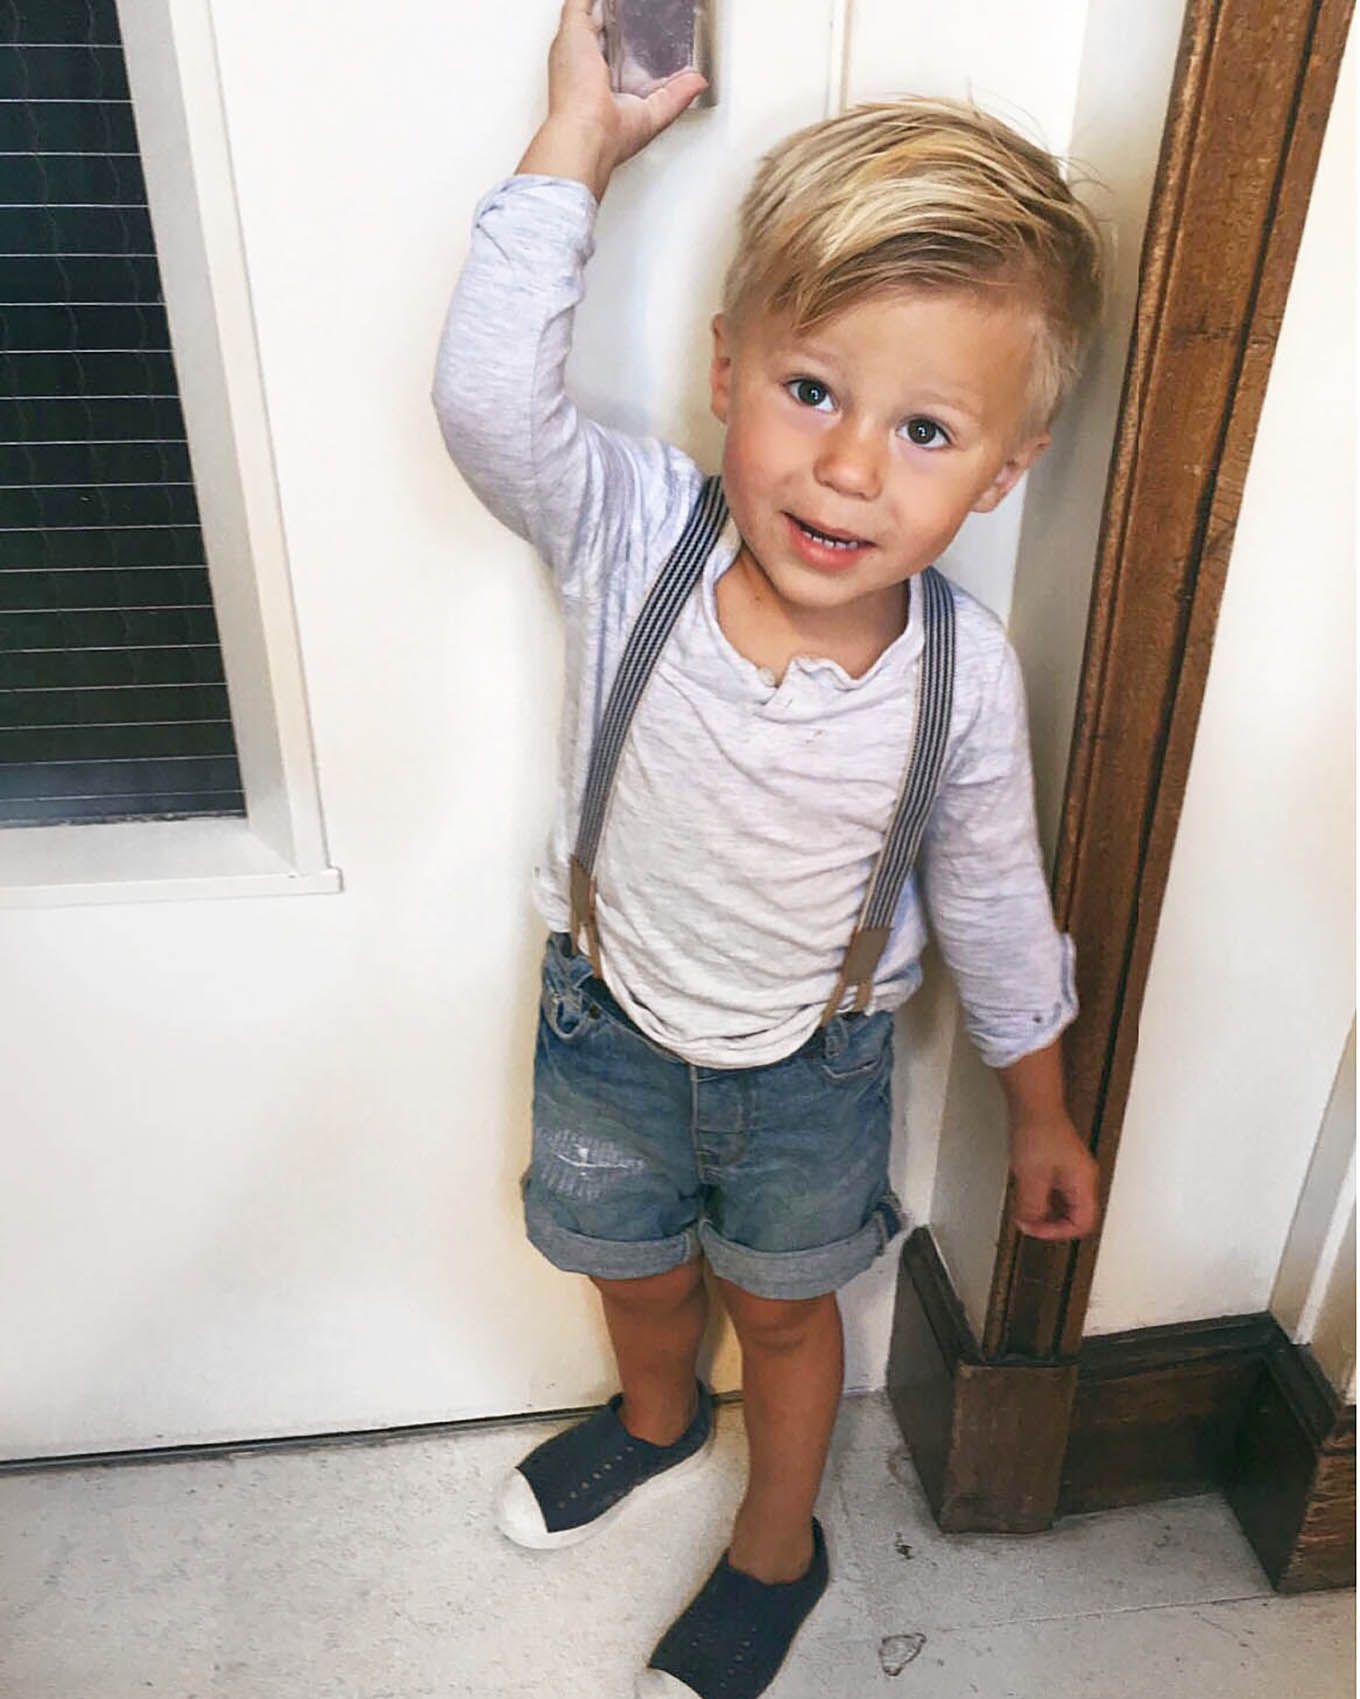 396d3d362 Beckam Turns 3! Happy Birthday Baby Boy! (Hello Fashion)